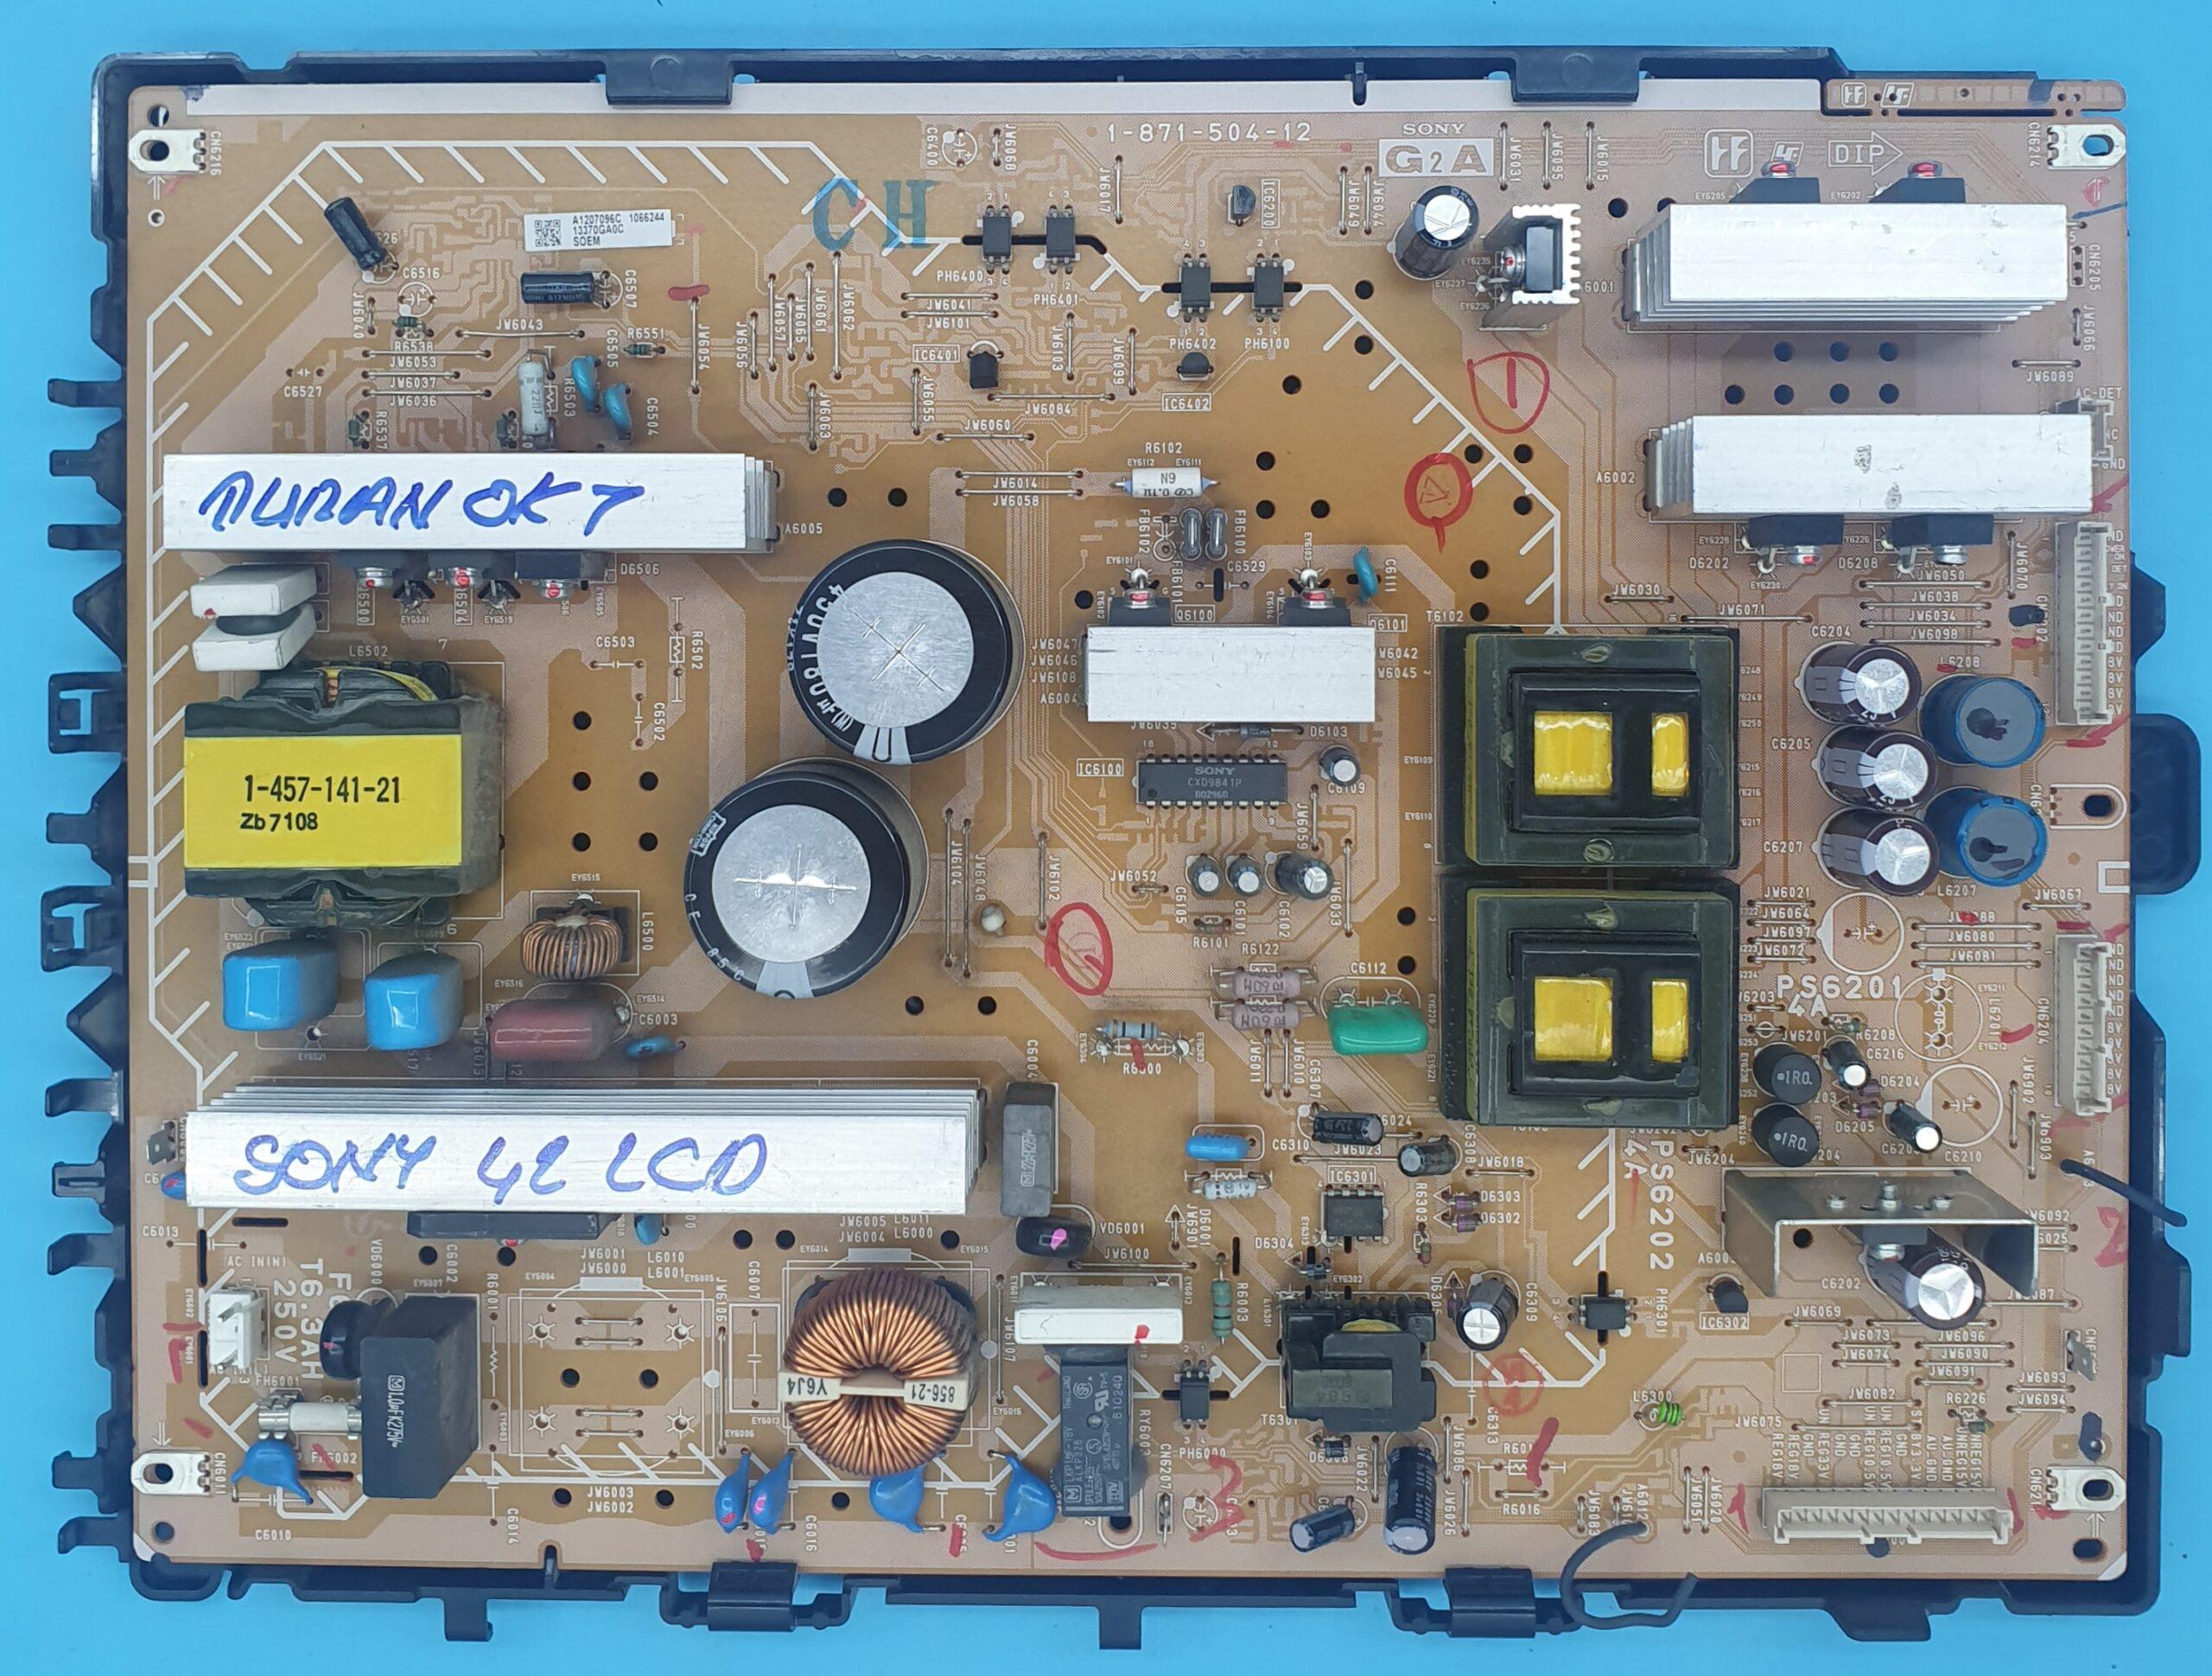 1-871-504-12 Sony Power (KDV DAHİL = 150 TL)